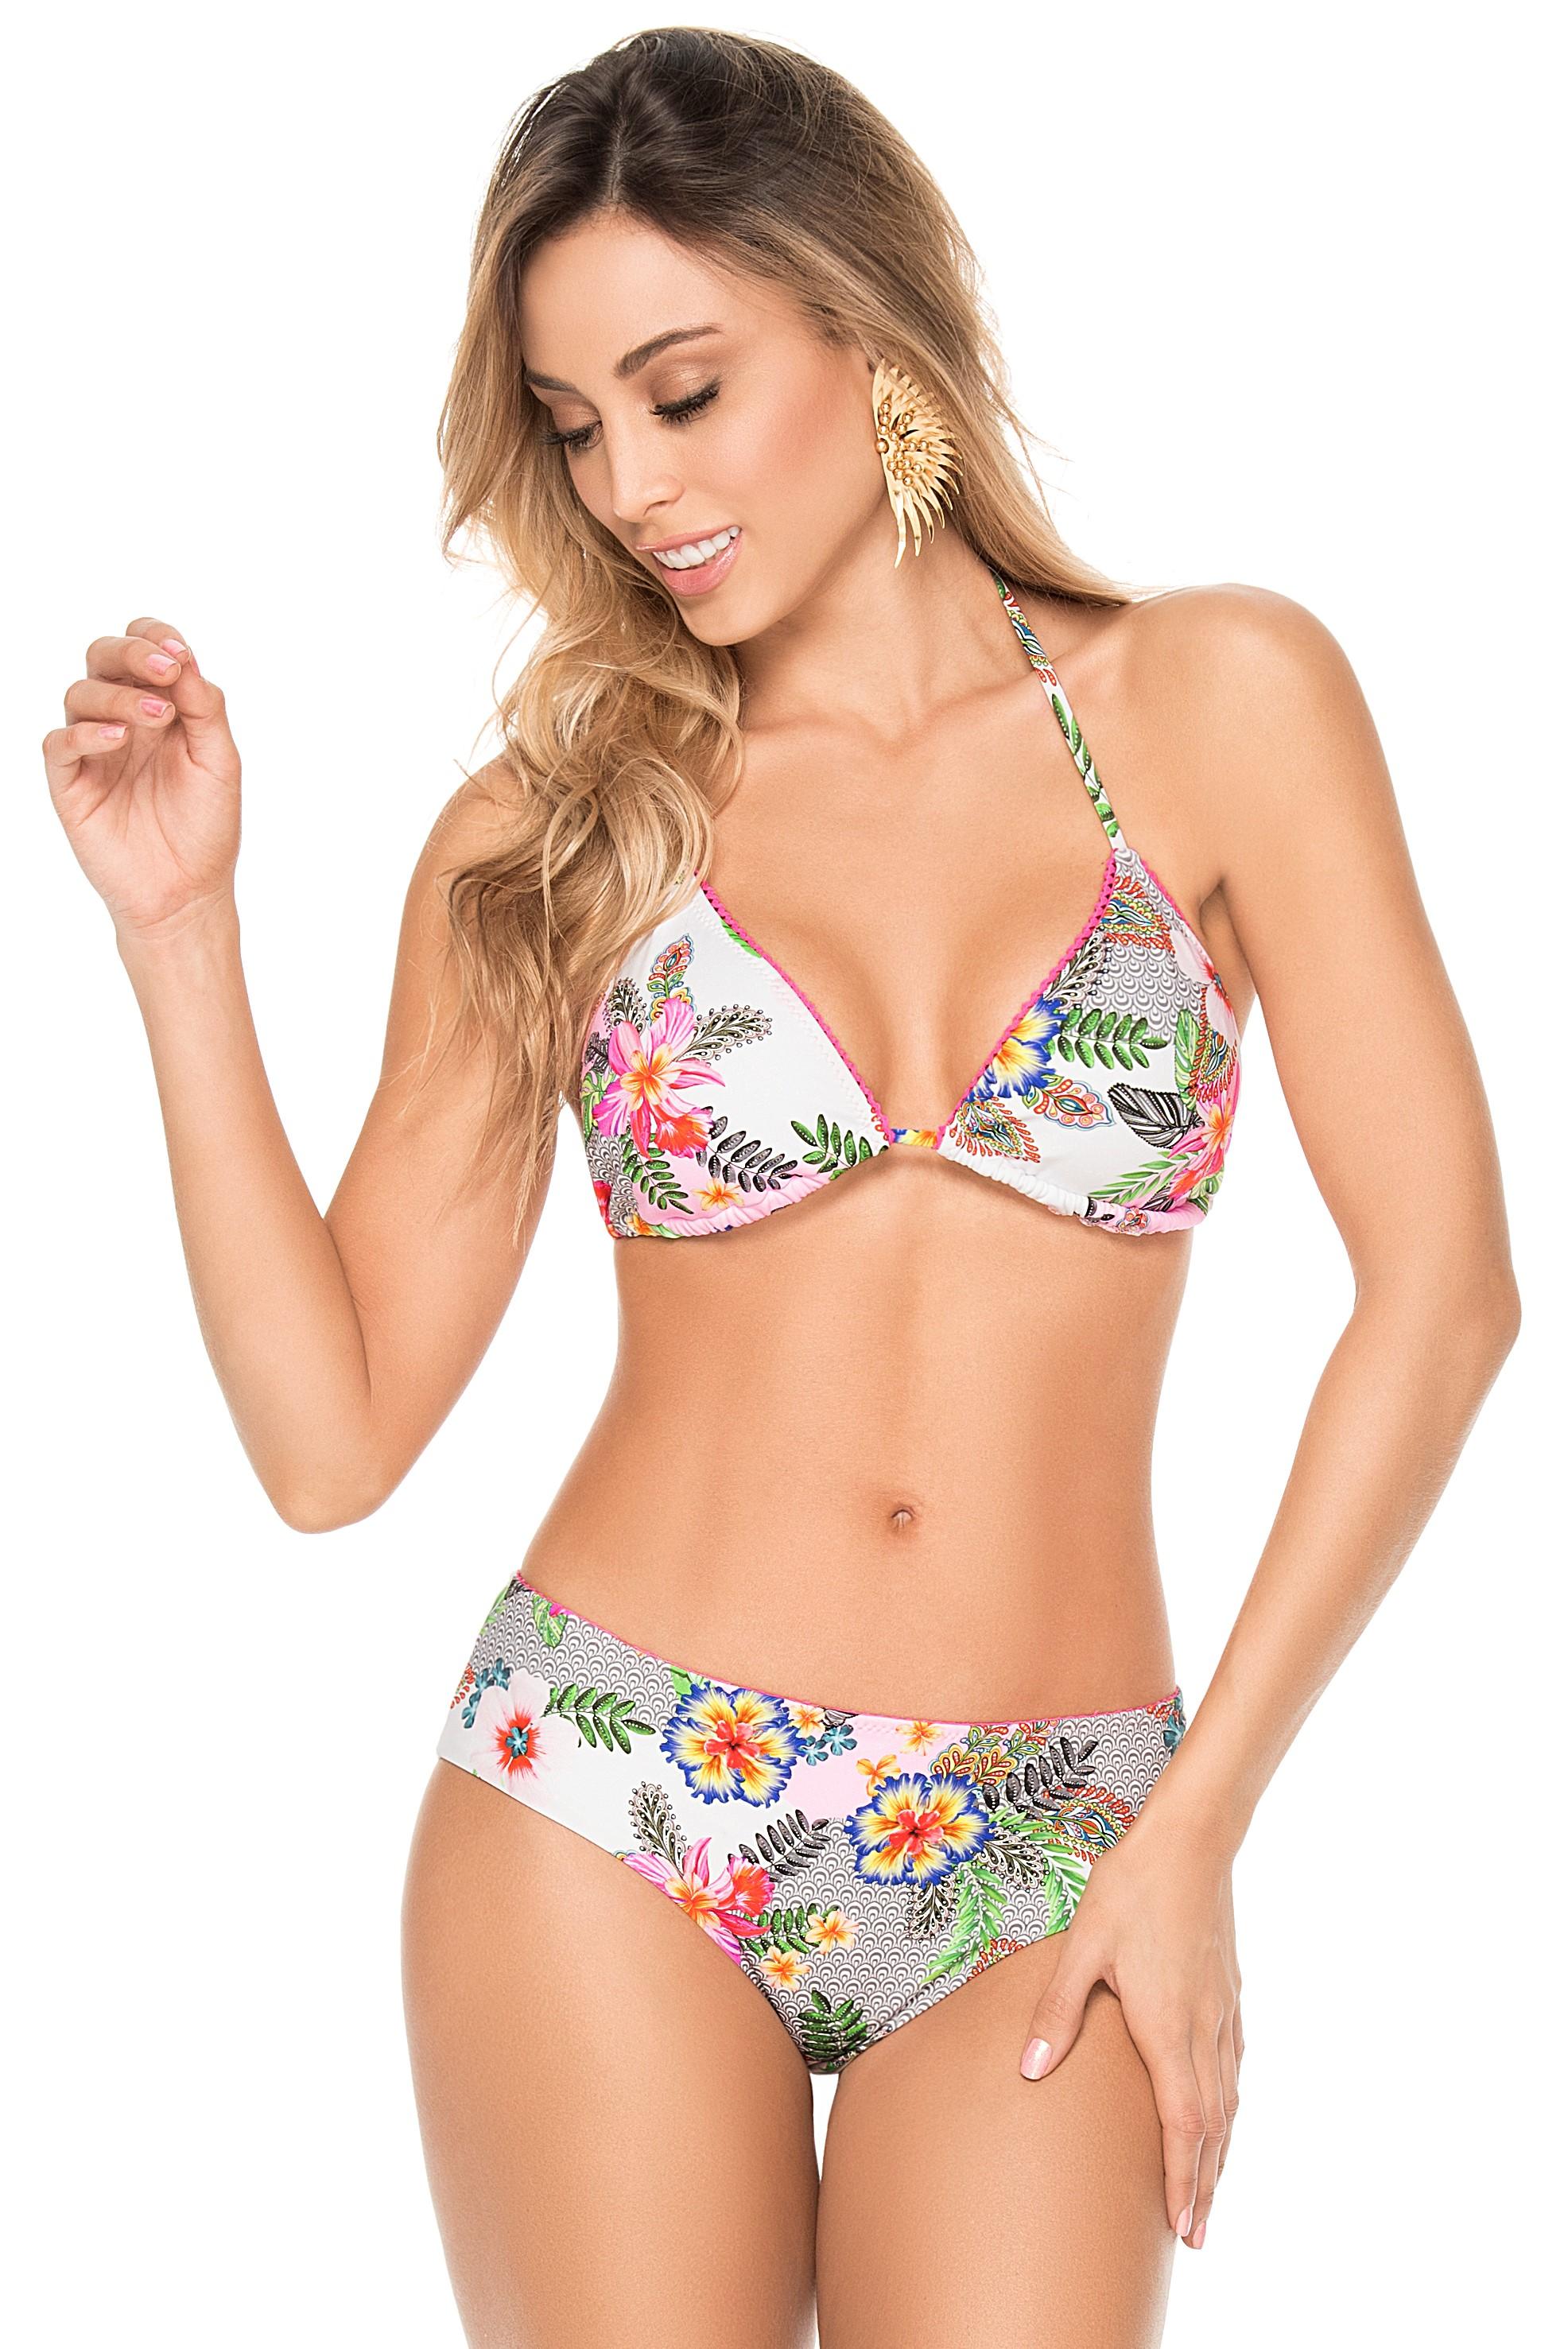 Phax Seagrass Bay Triangle Bikini